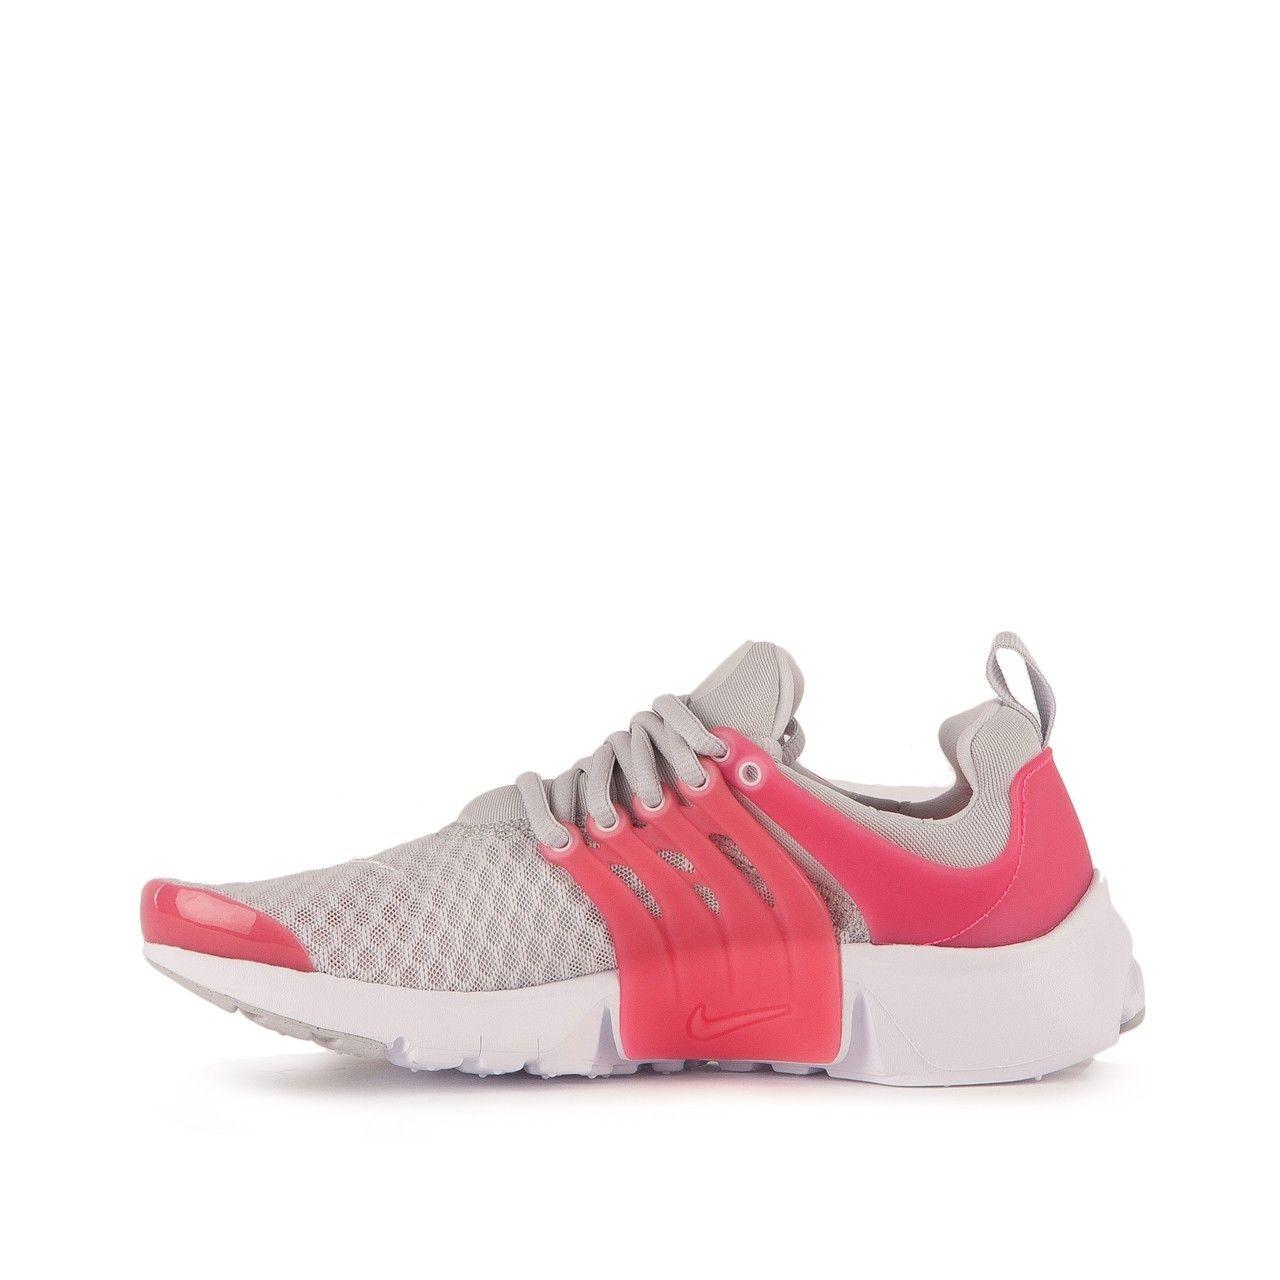 42422bcb79808 Nike Presto BR GS (Hellgrau   Pink)   Pinterest   Nike presto ...